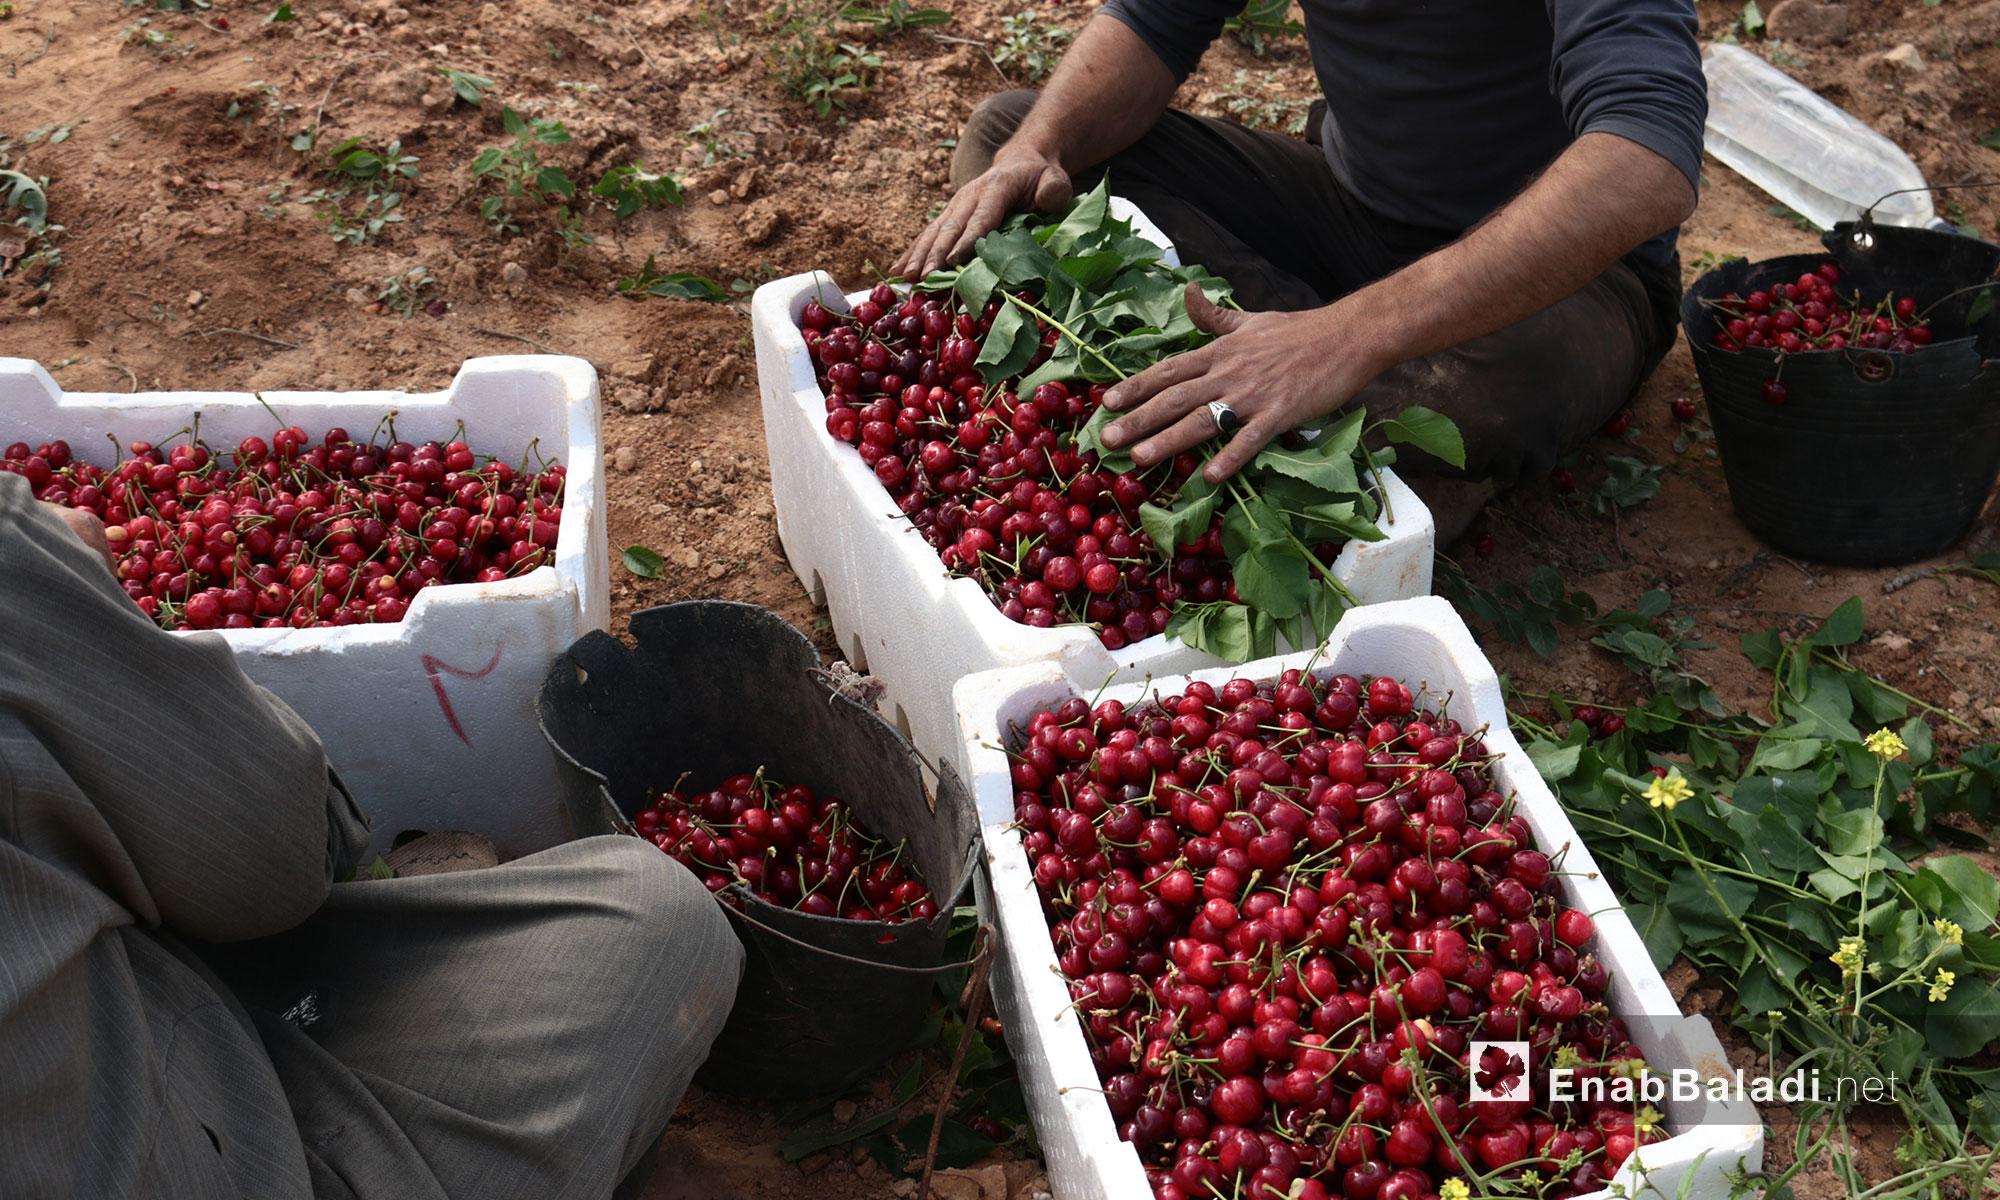 Chery season in the Mount Zāwiya in rural Idlib – May 9. 2018 (Enab Baladi)